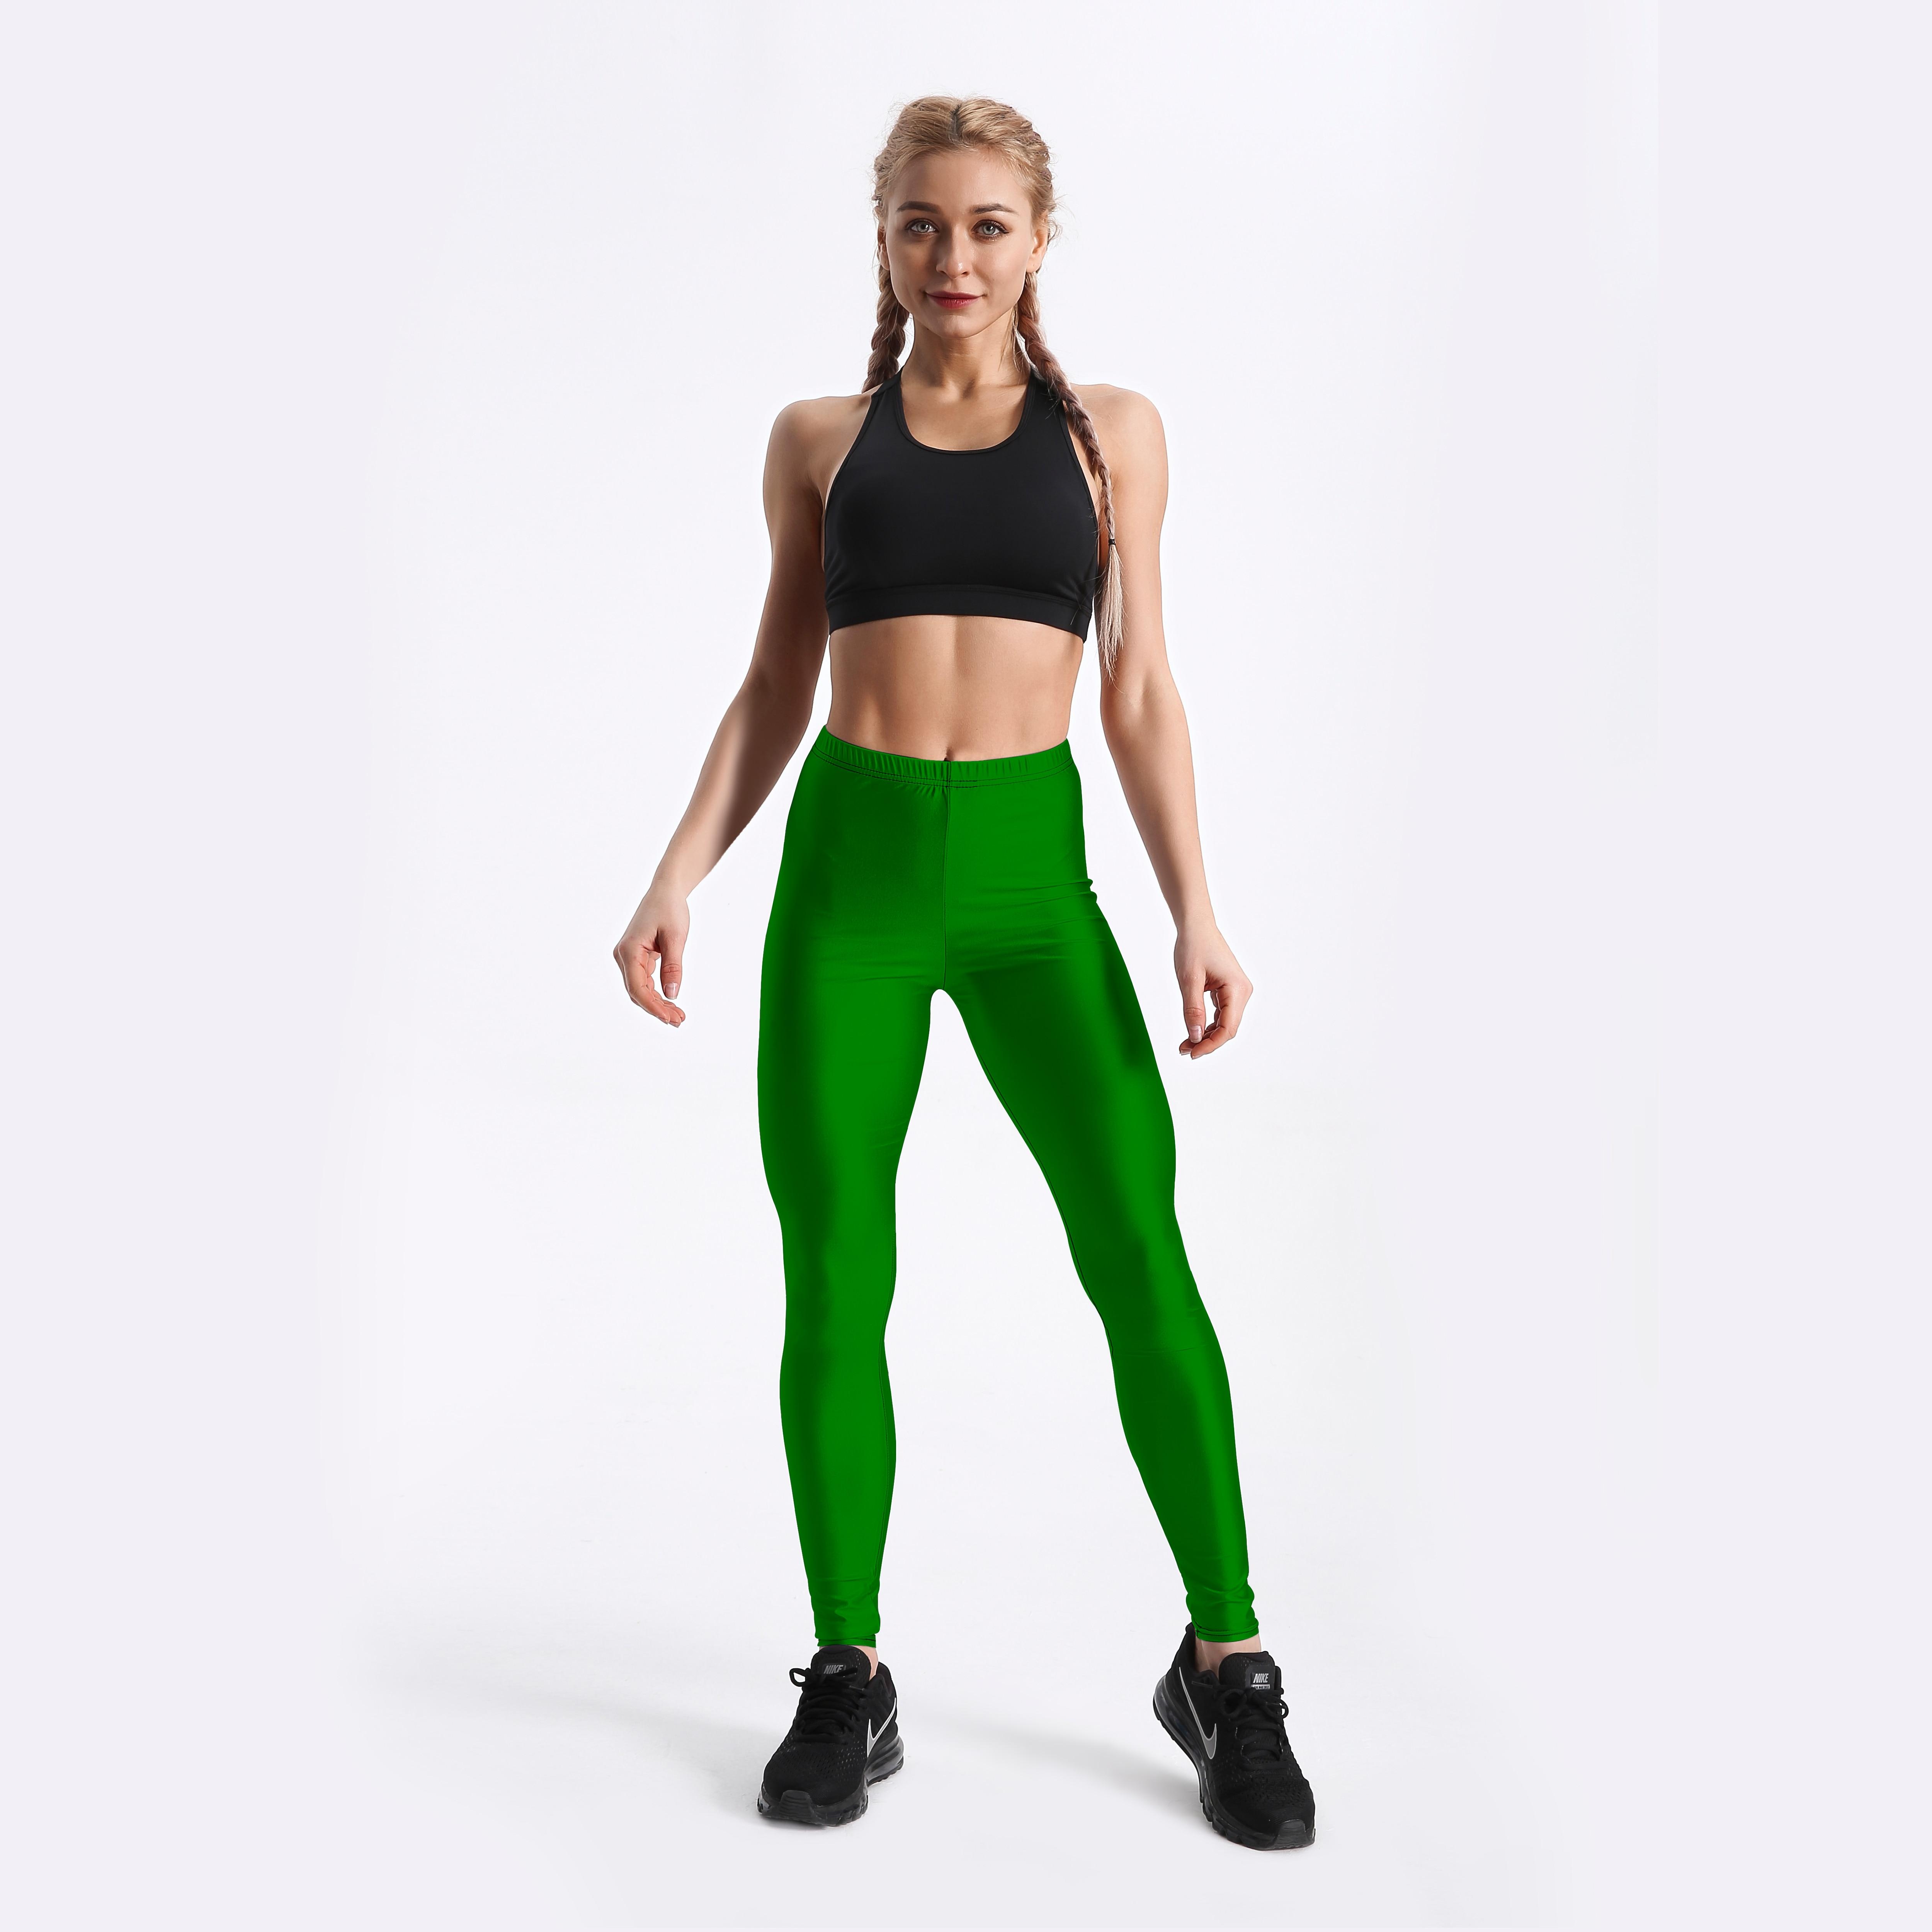 Qickitout Private Custom Dark Green  Leggings Customer Digital Printed Leggings  USA Size XS-XL Jk28-005